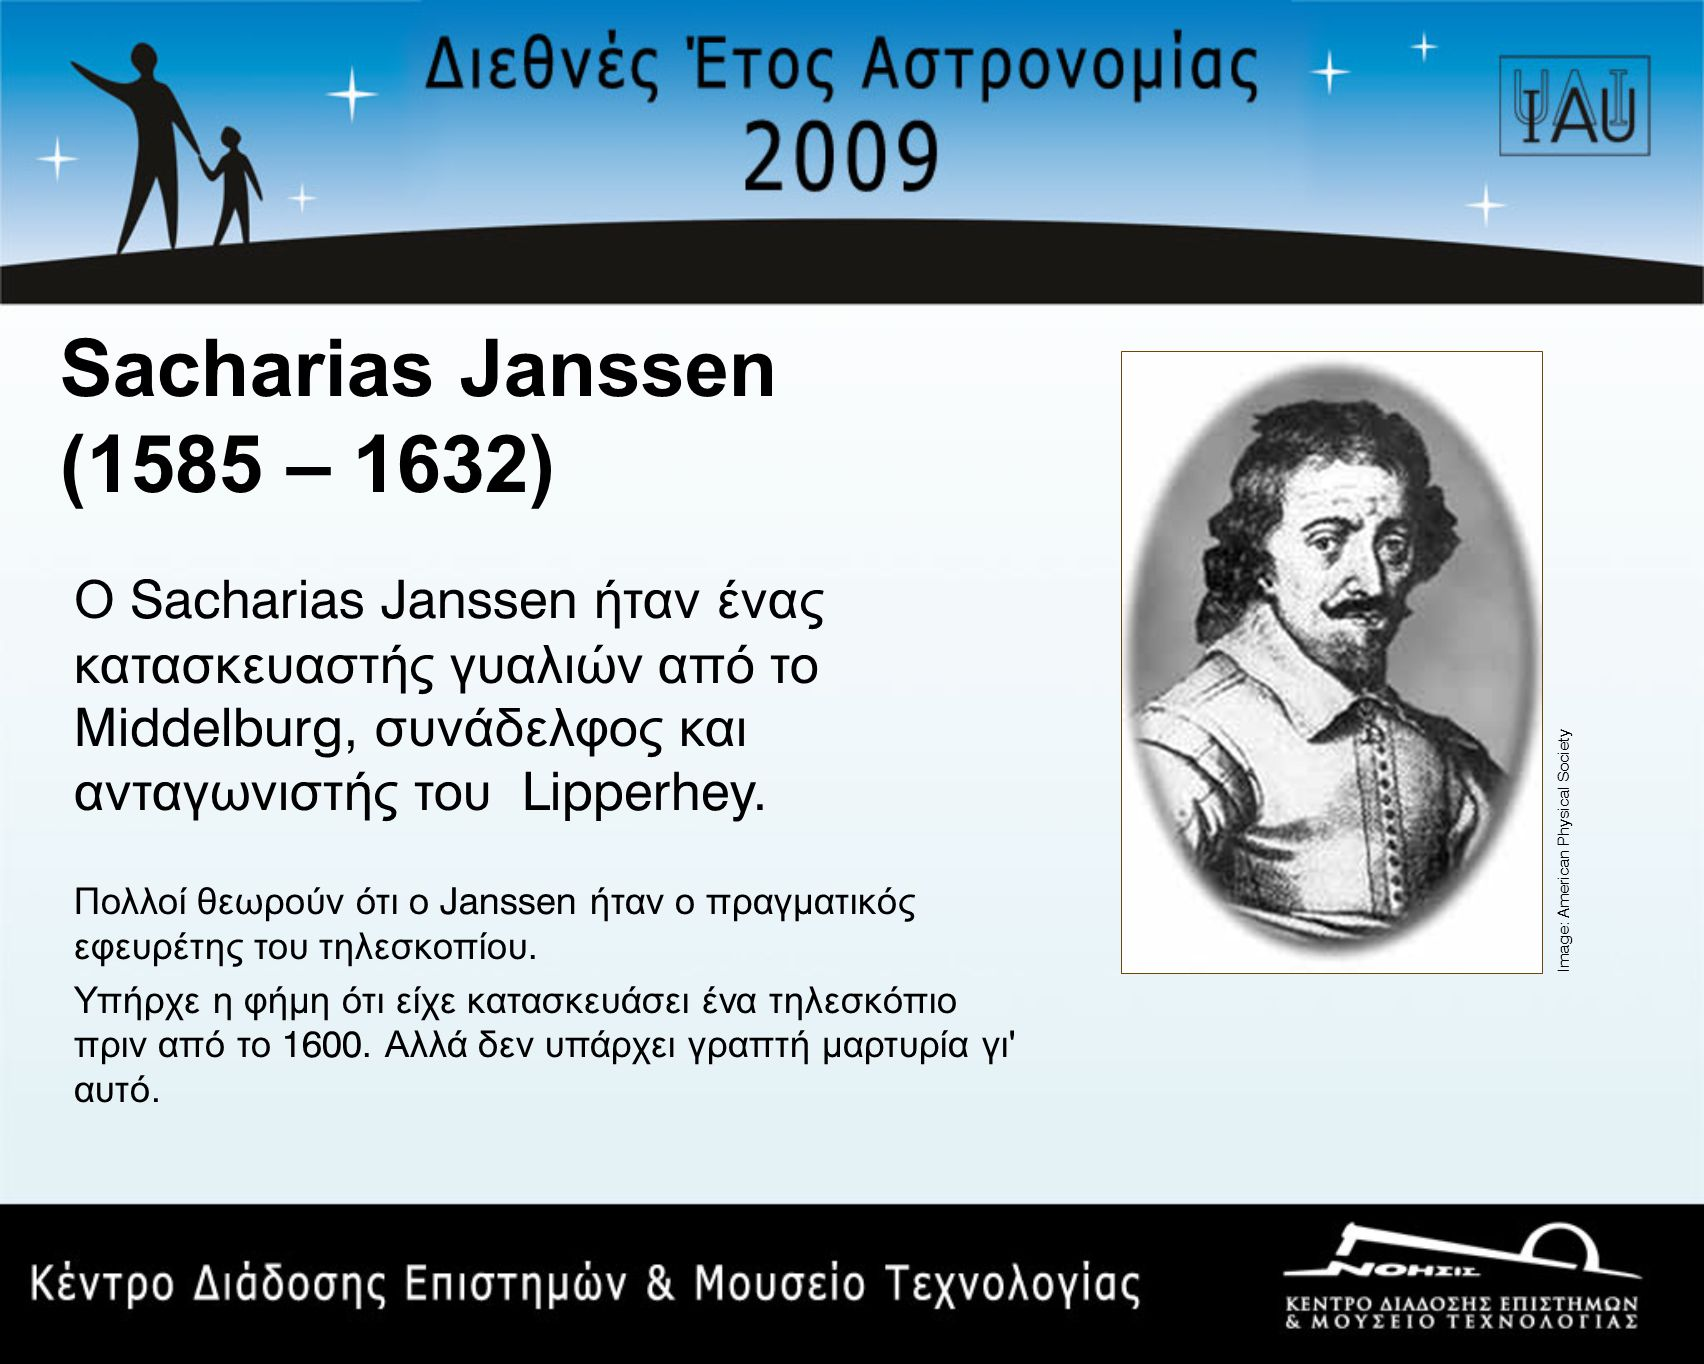 Sacharias Janssen (1585 – 1632) Ο Sacharias Janssen ήταν ένας κατασκευαστής γυαλιών από το Middelburg, συνάδελφος και ανταγωνιστής του Lipperhey.